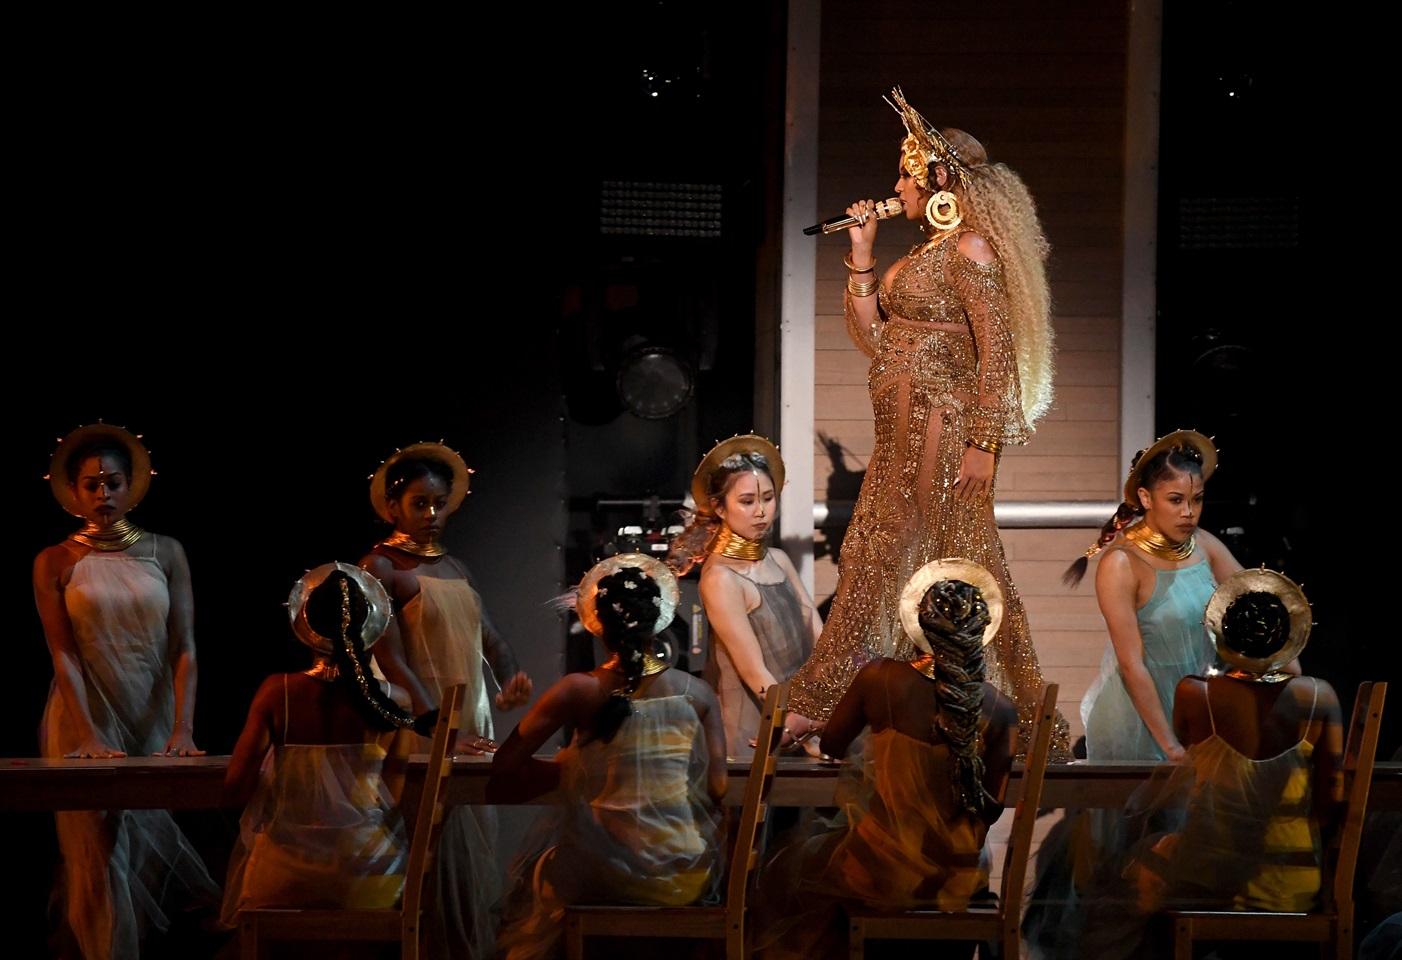 Grammy Awards: Laura Pausini non riesce nell'impresa